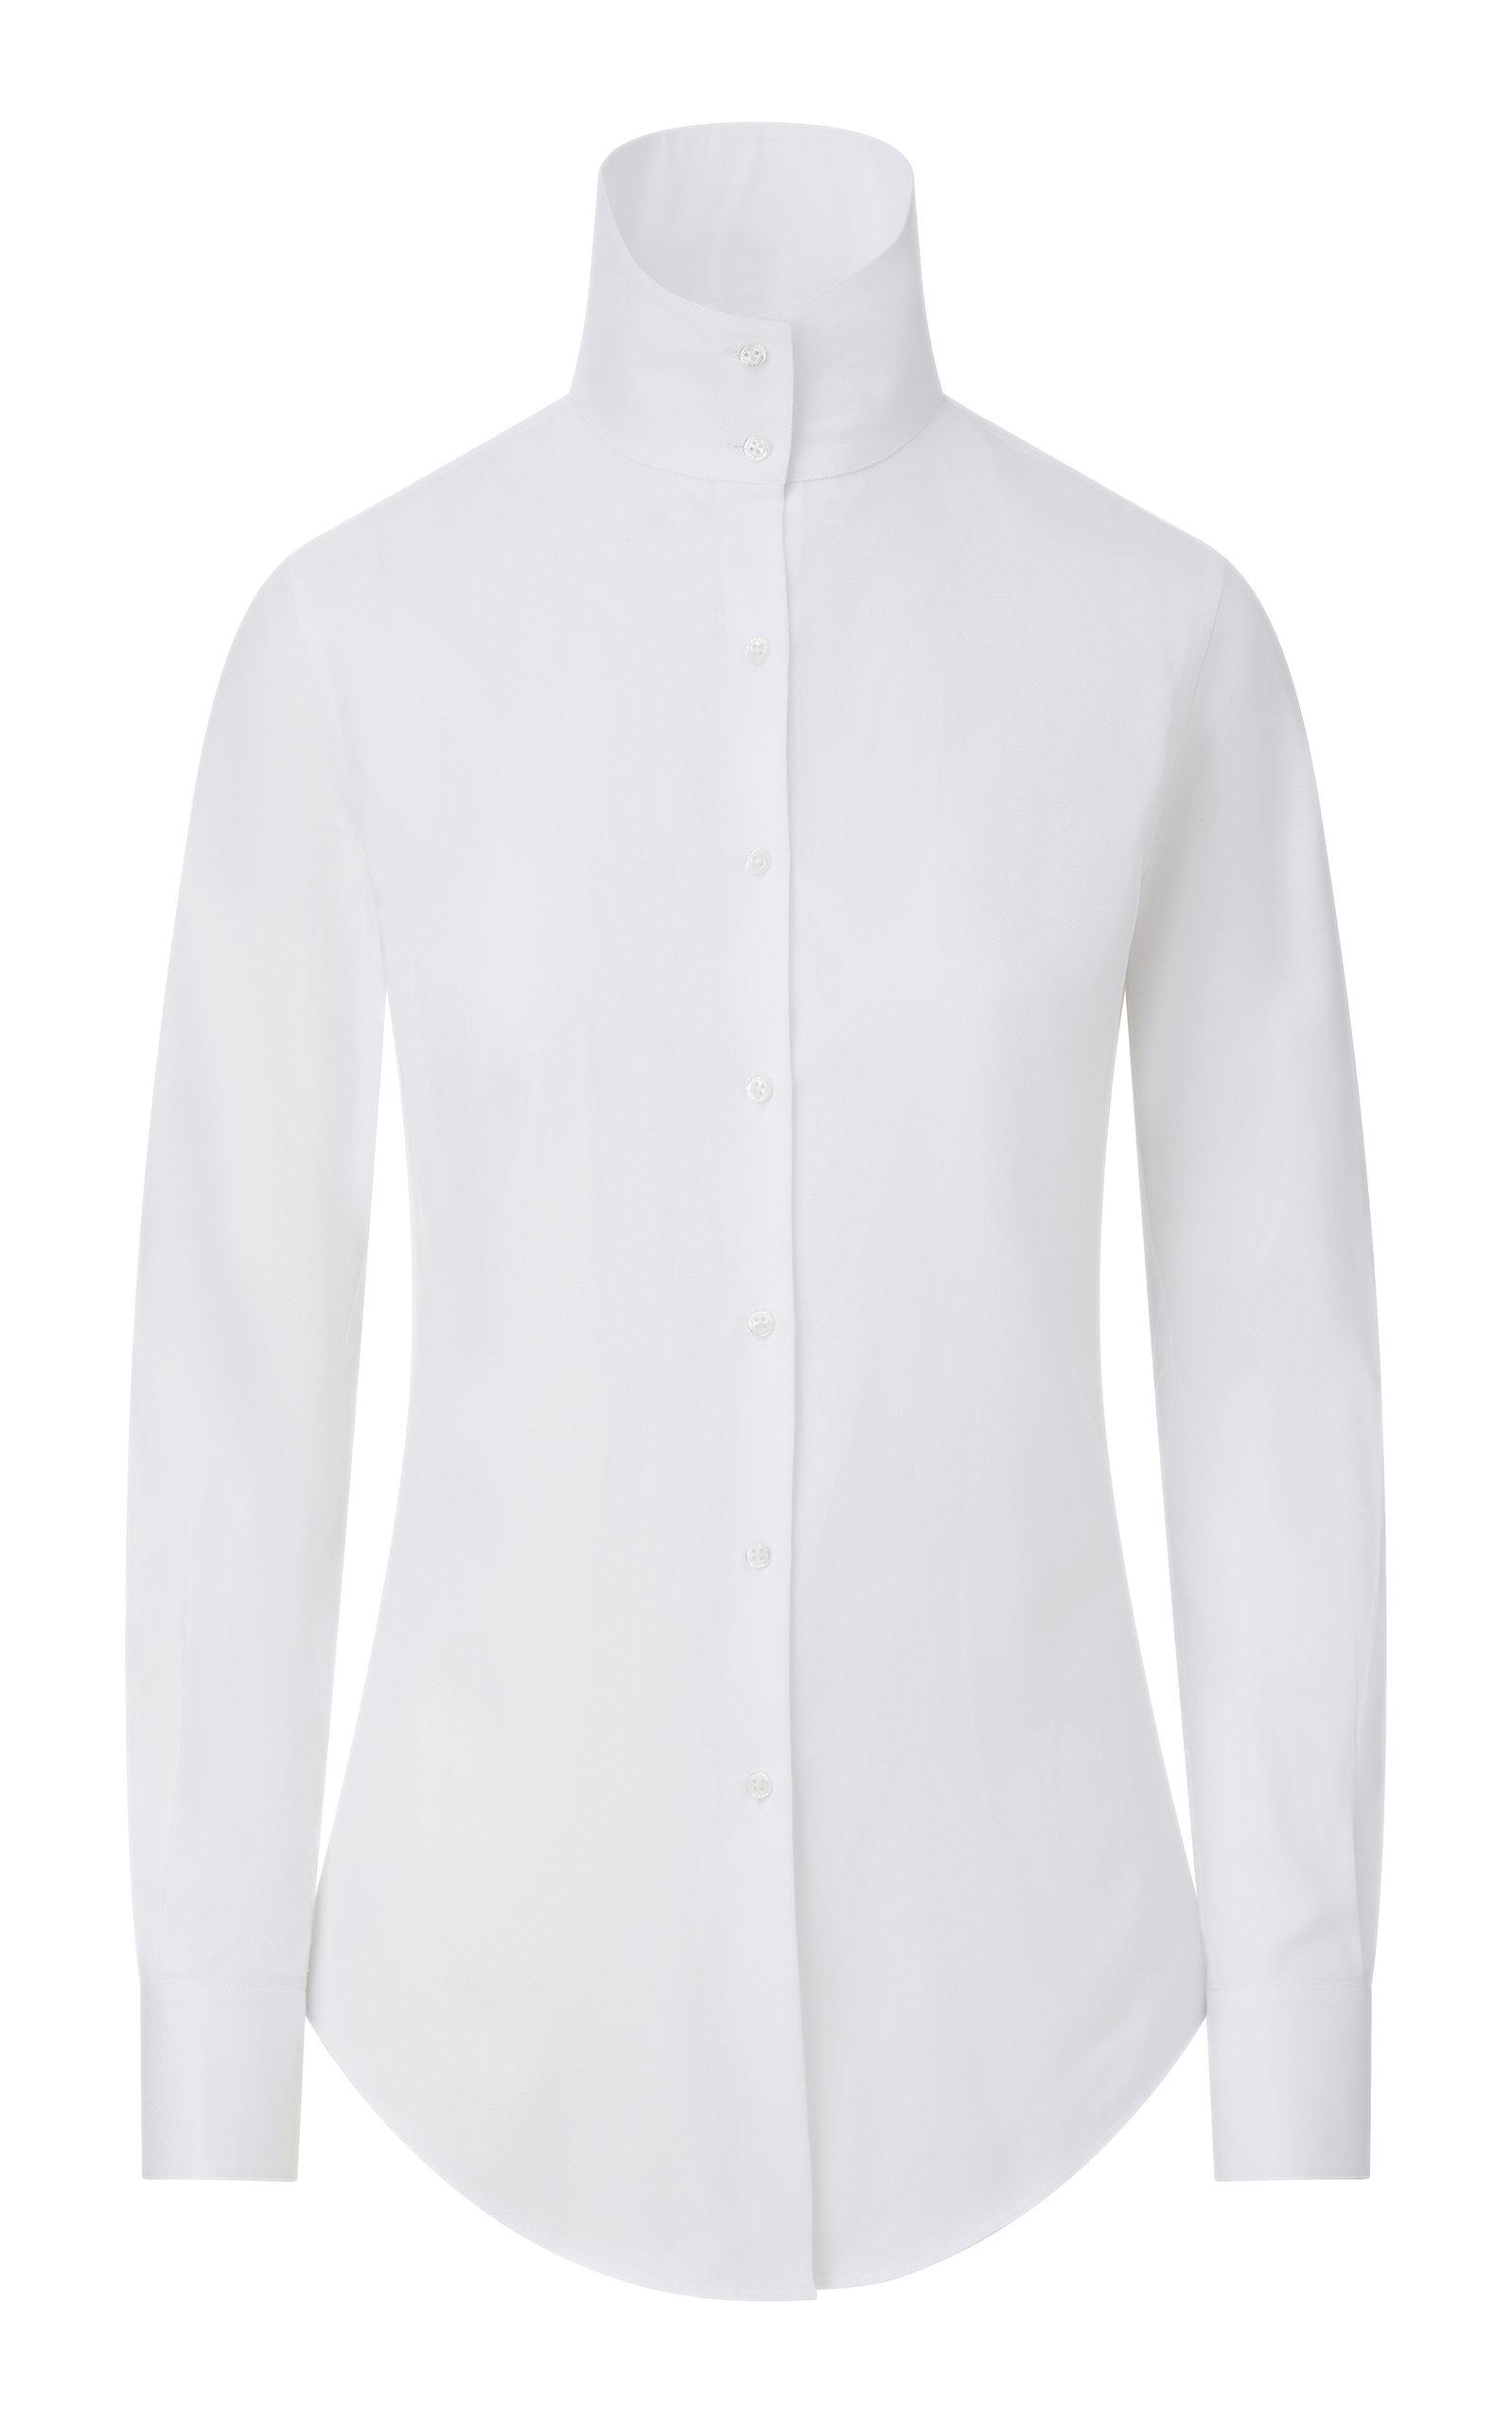 Women's Funnel-Neck Cotton Button-Down Shirt